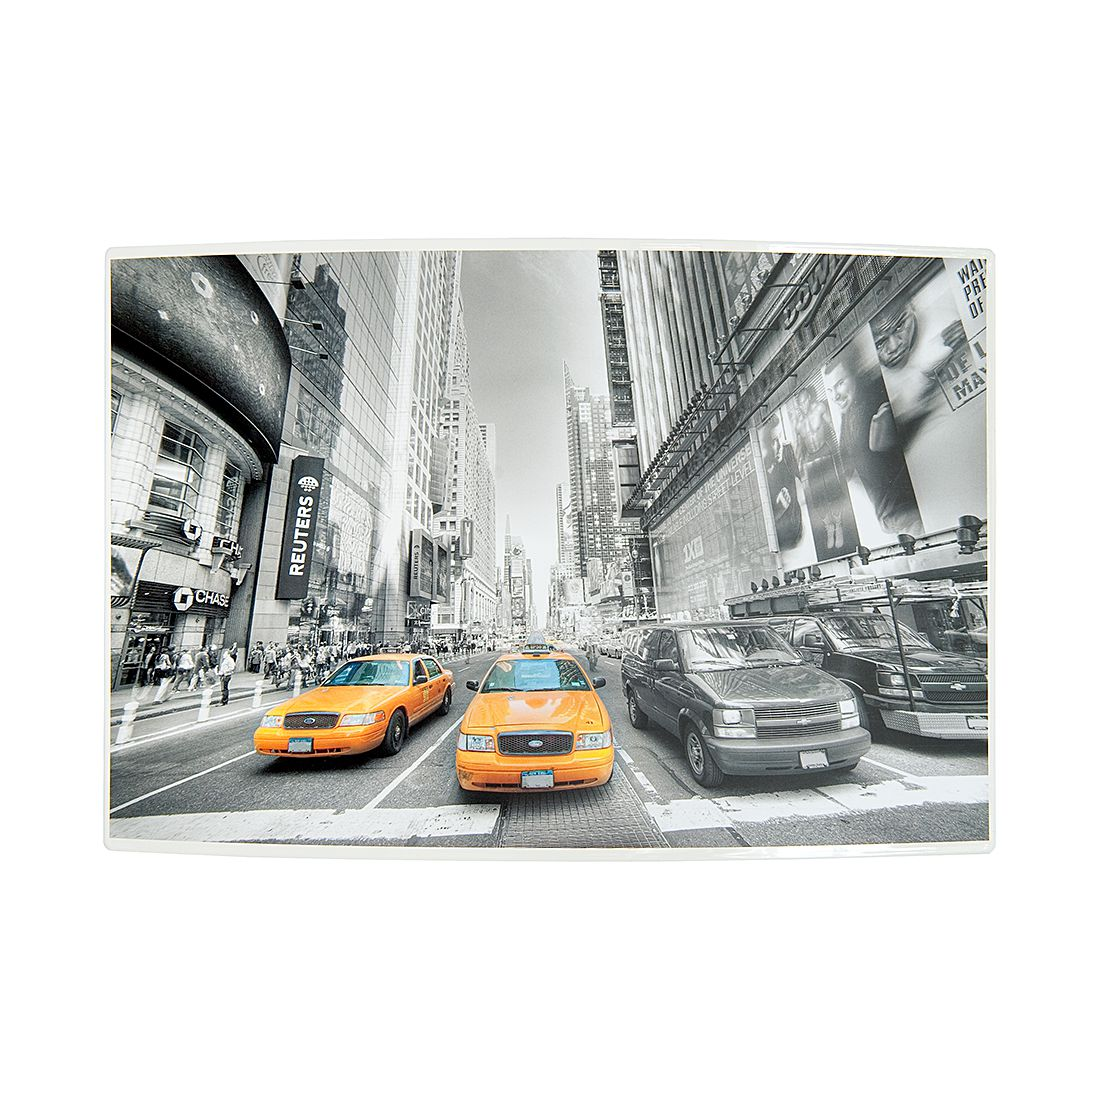 Home 24 - Boîte à clefs city new york - métal, fredriks